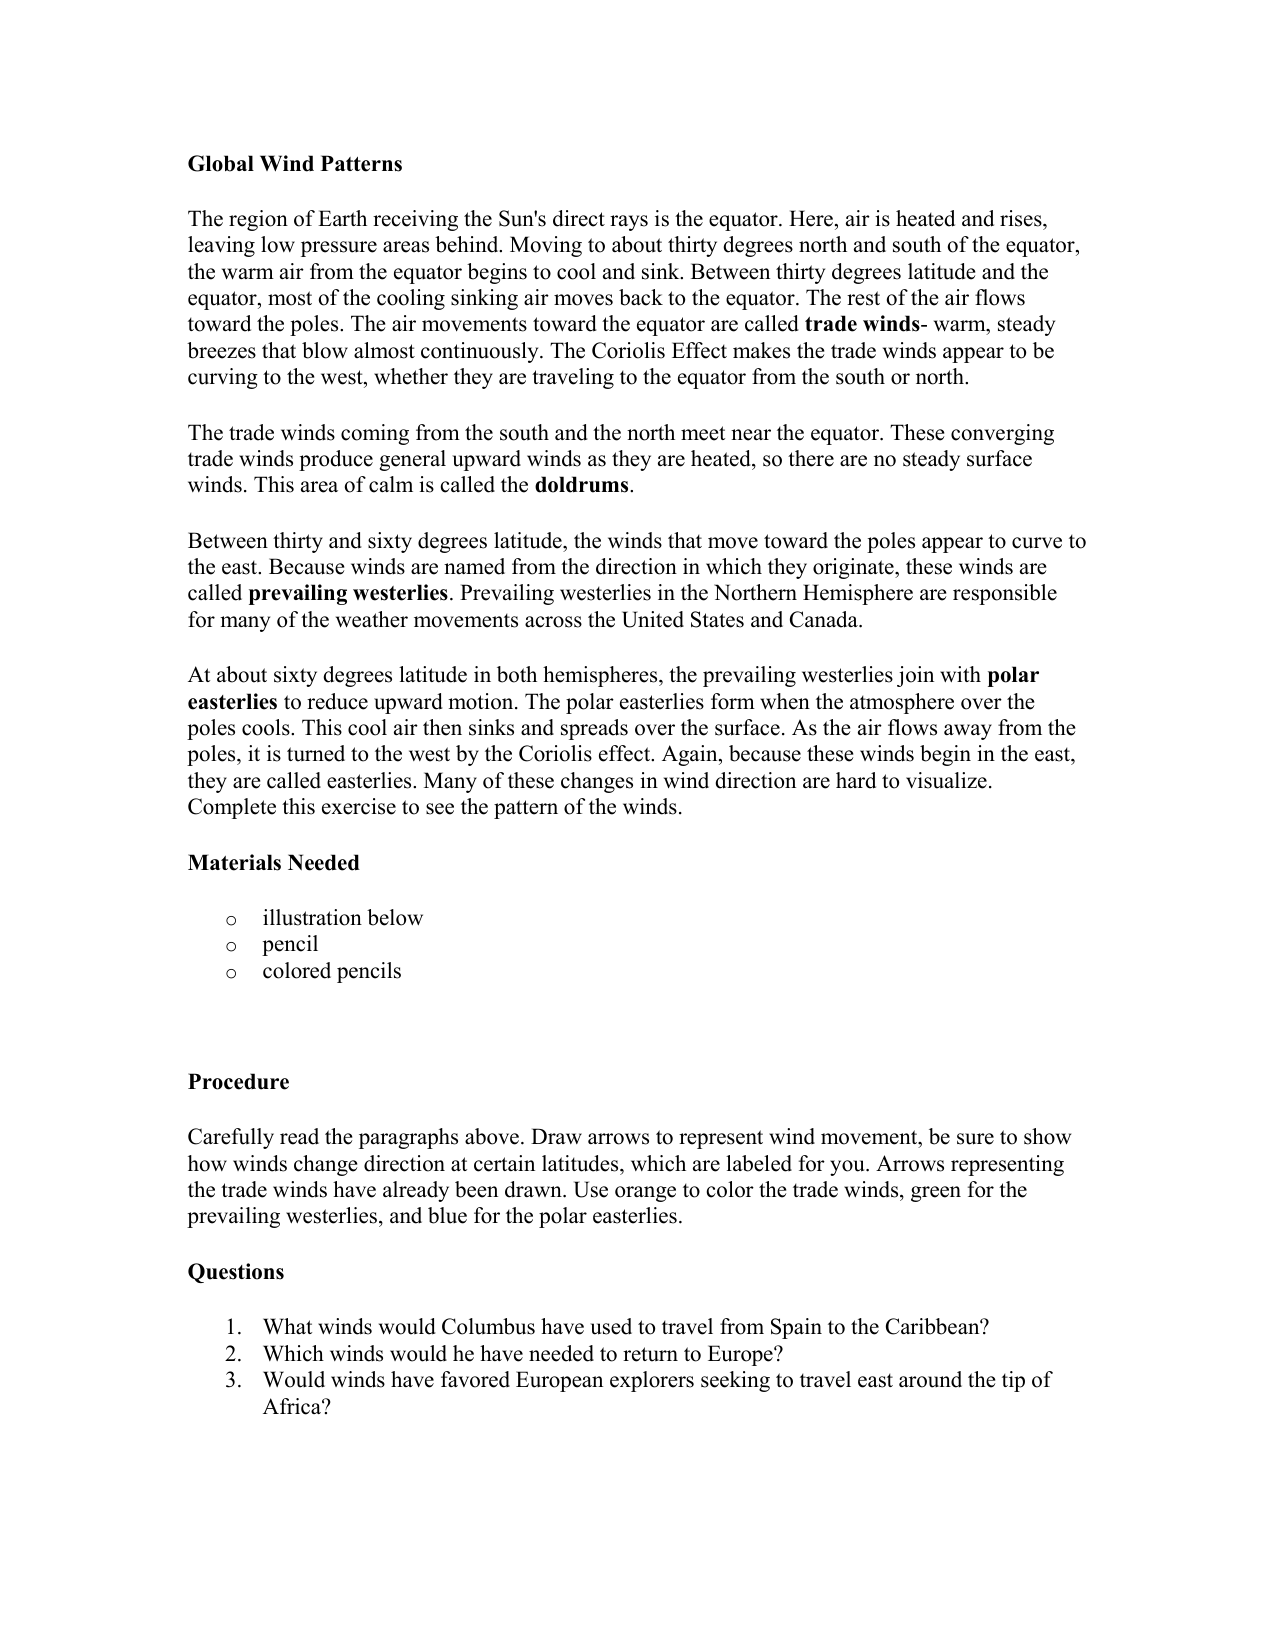 worksheet Global Wind Patterns Worksheet global wind patterns worksheet